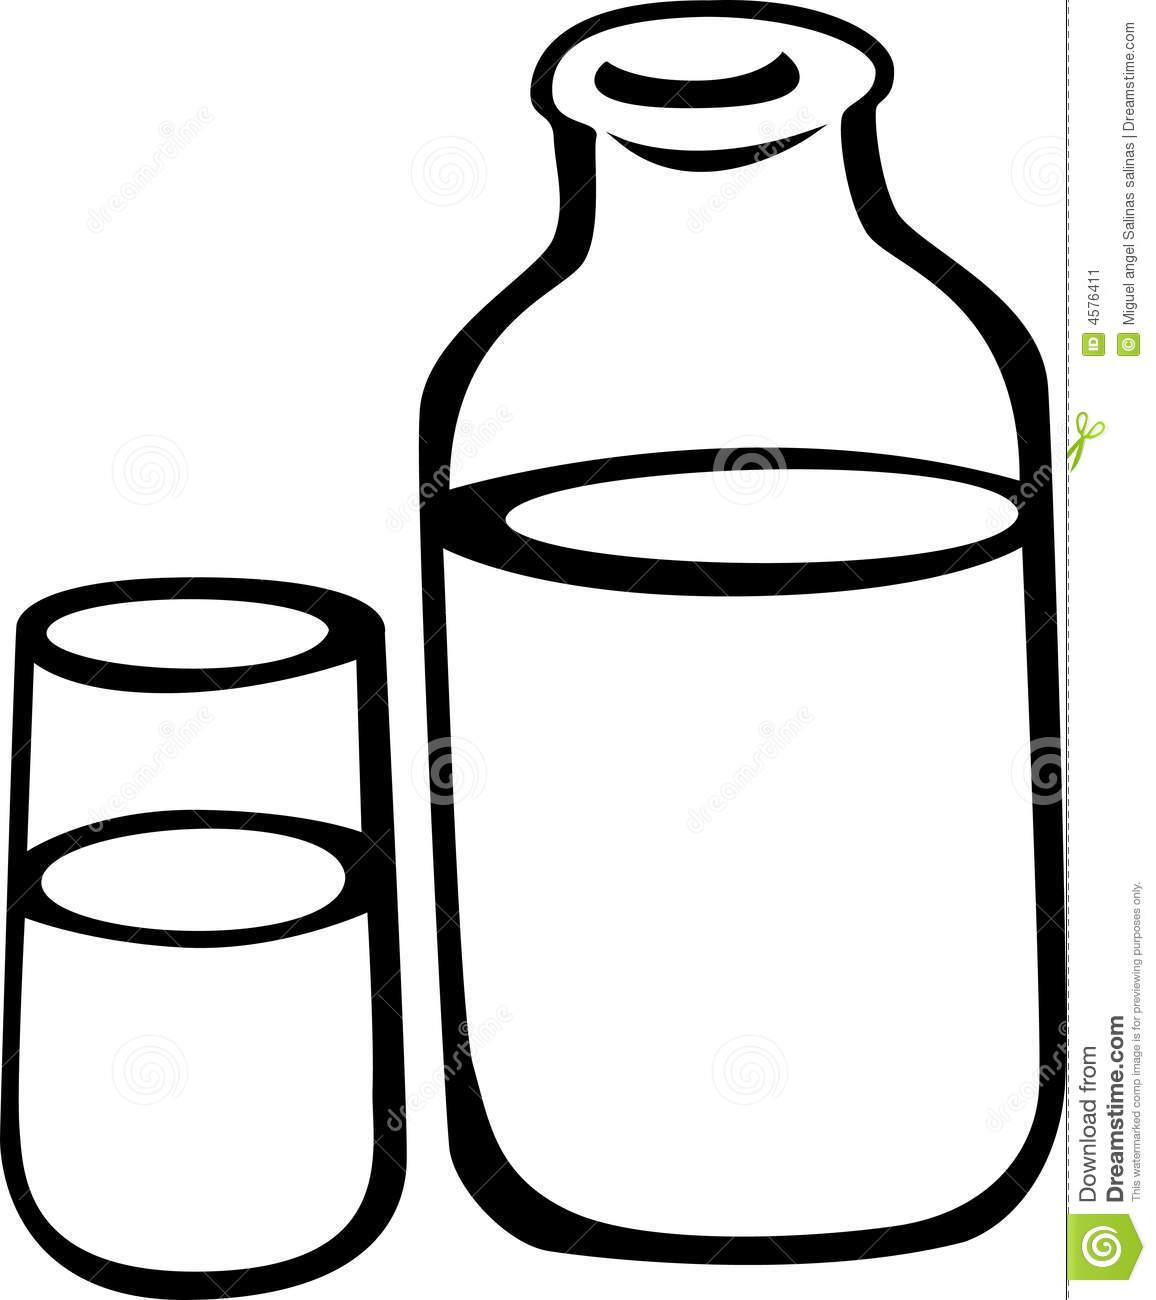 1156x1300 Milk Glass Clipart